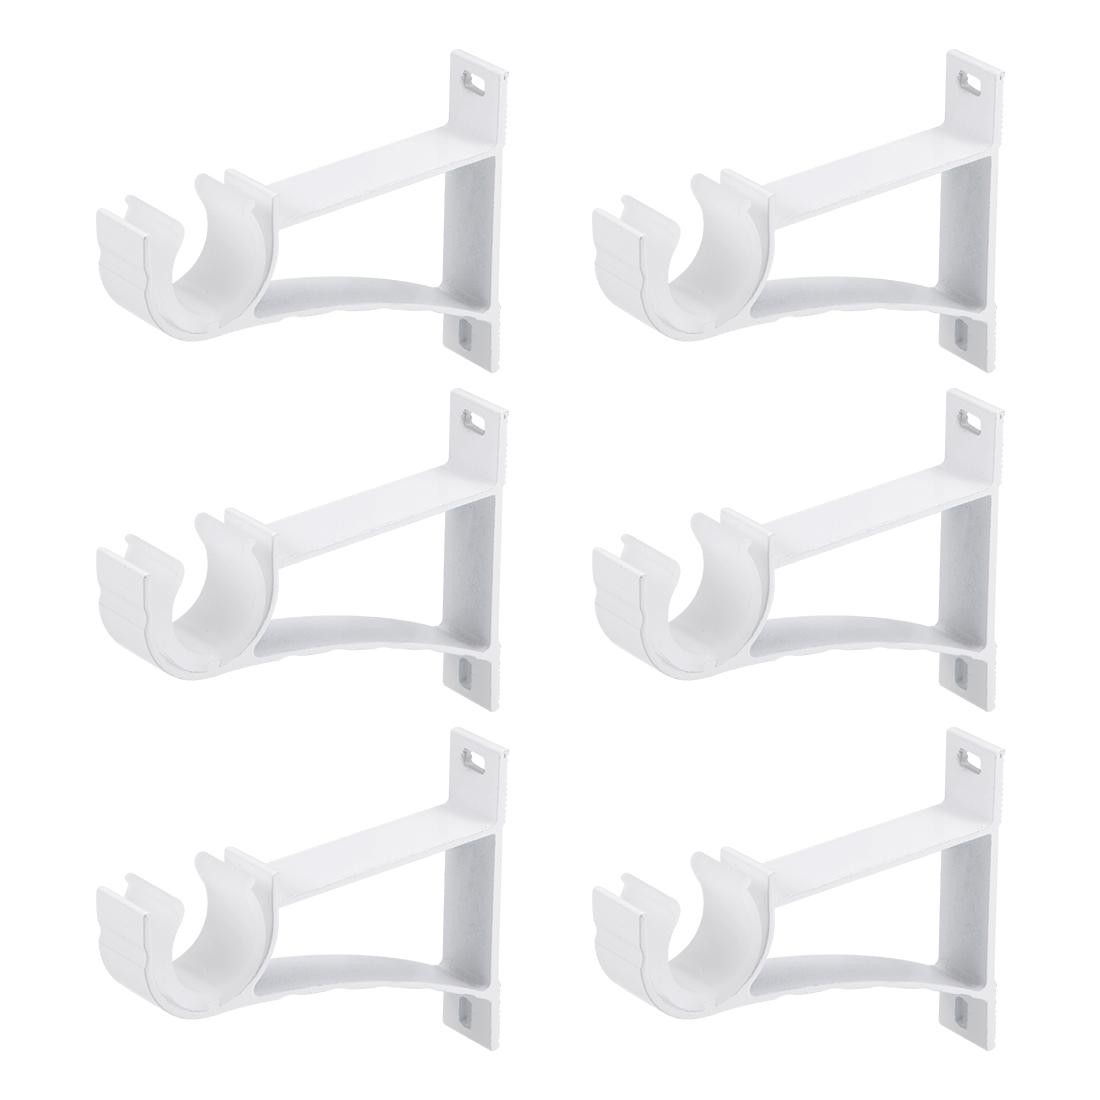 Curtain Rod Bracket Single Holder for 24mm Rod 108 x 82 x 19mm Milky White 6Sets